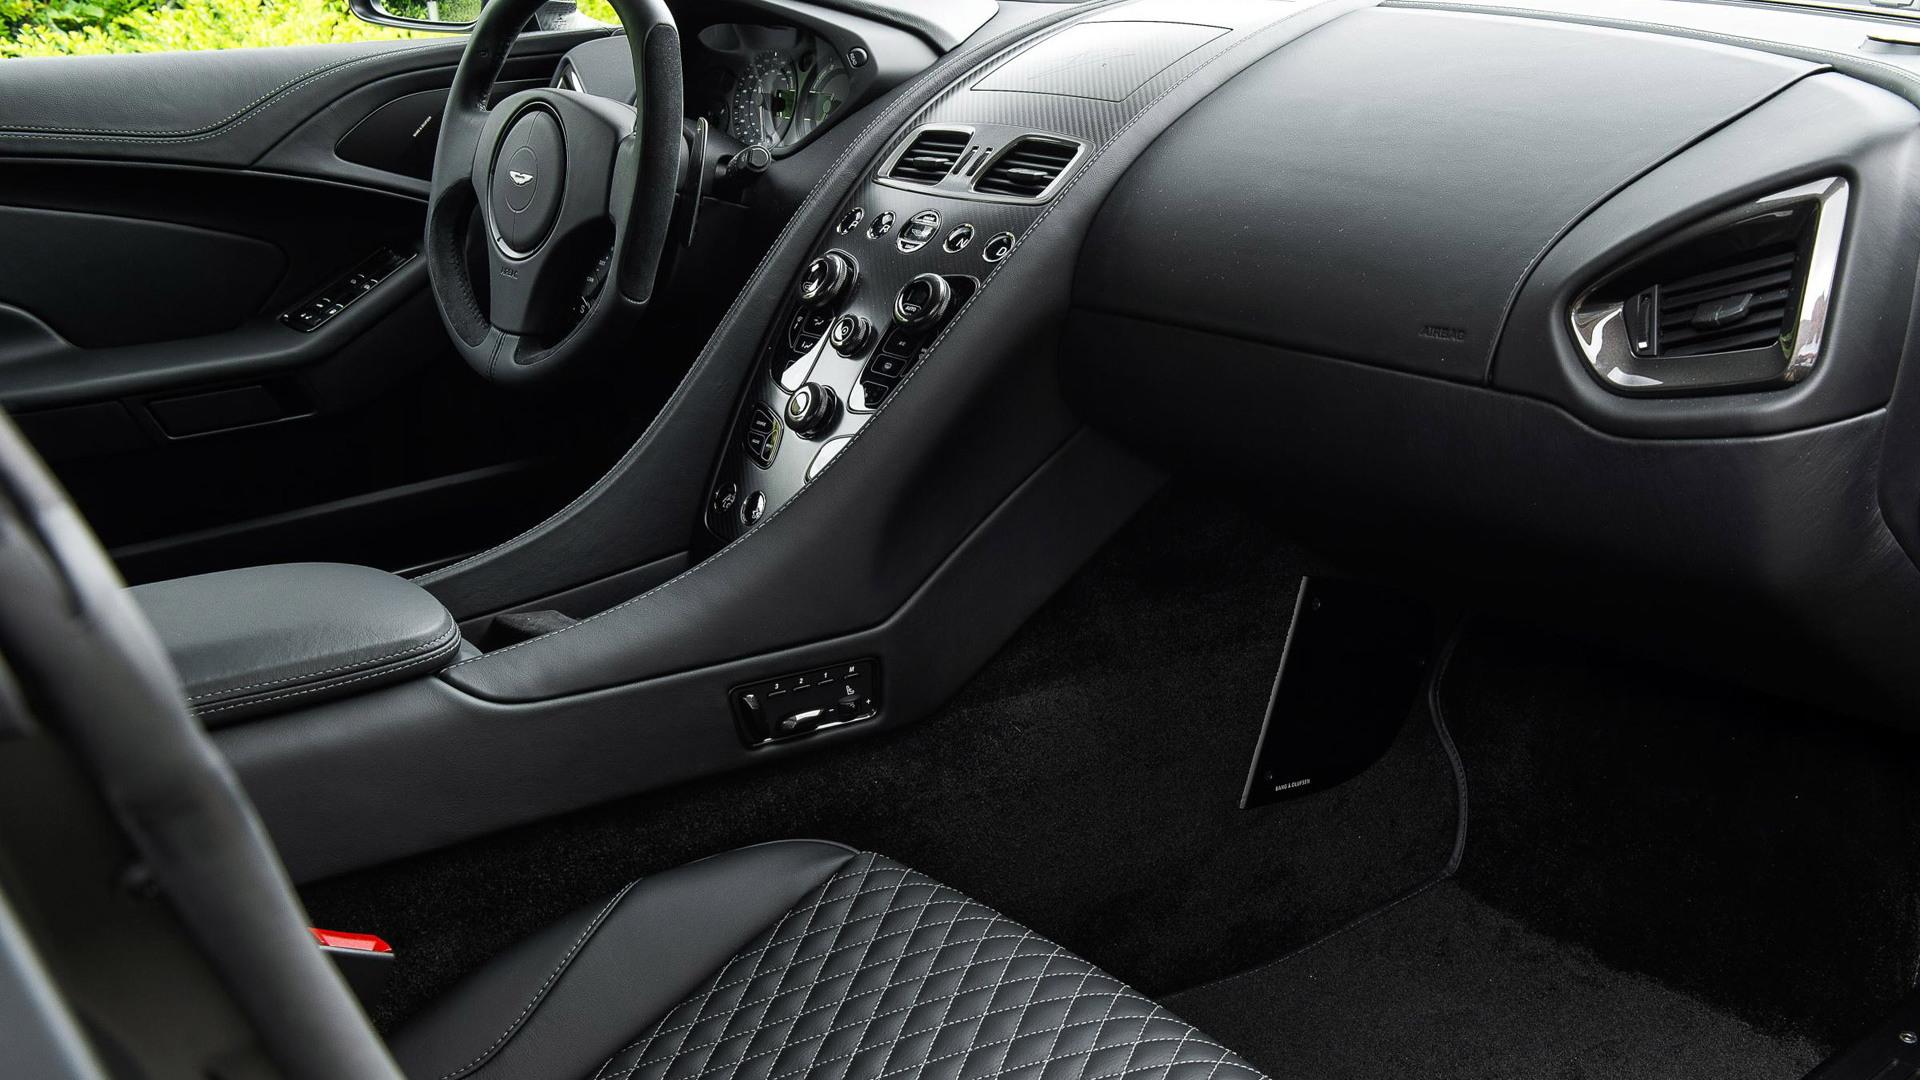 2015 Aston Martin Vanquish 'One of Seven'